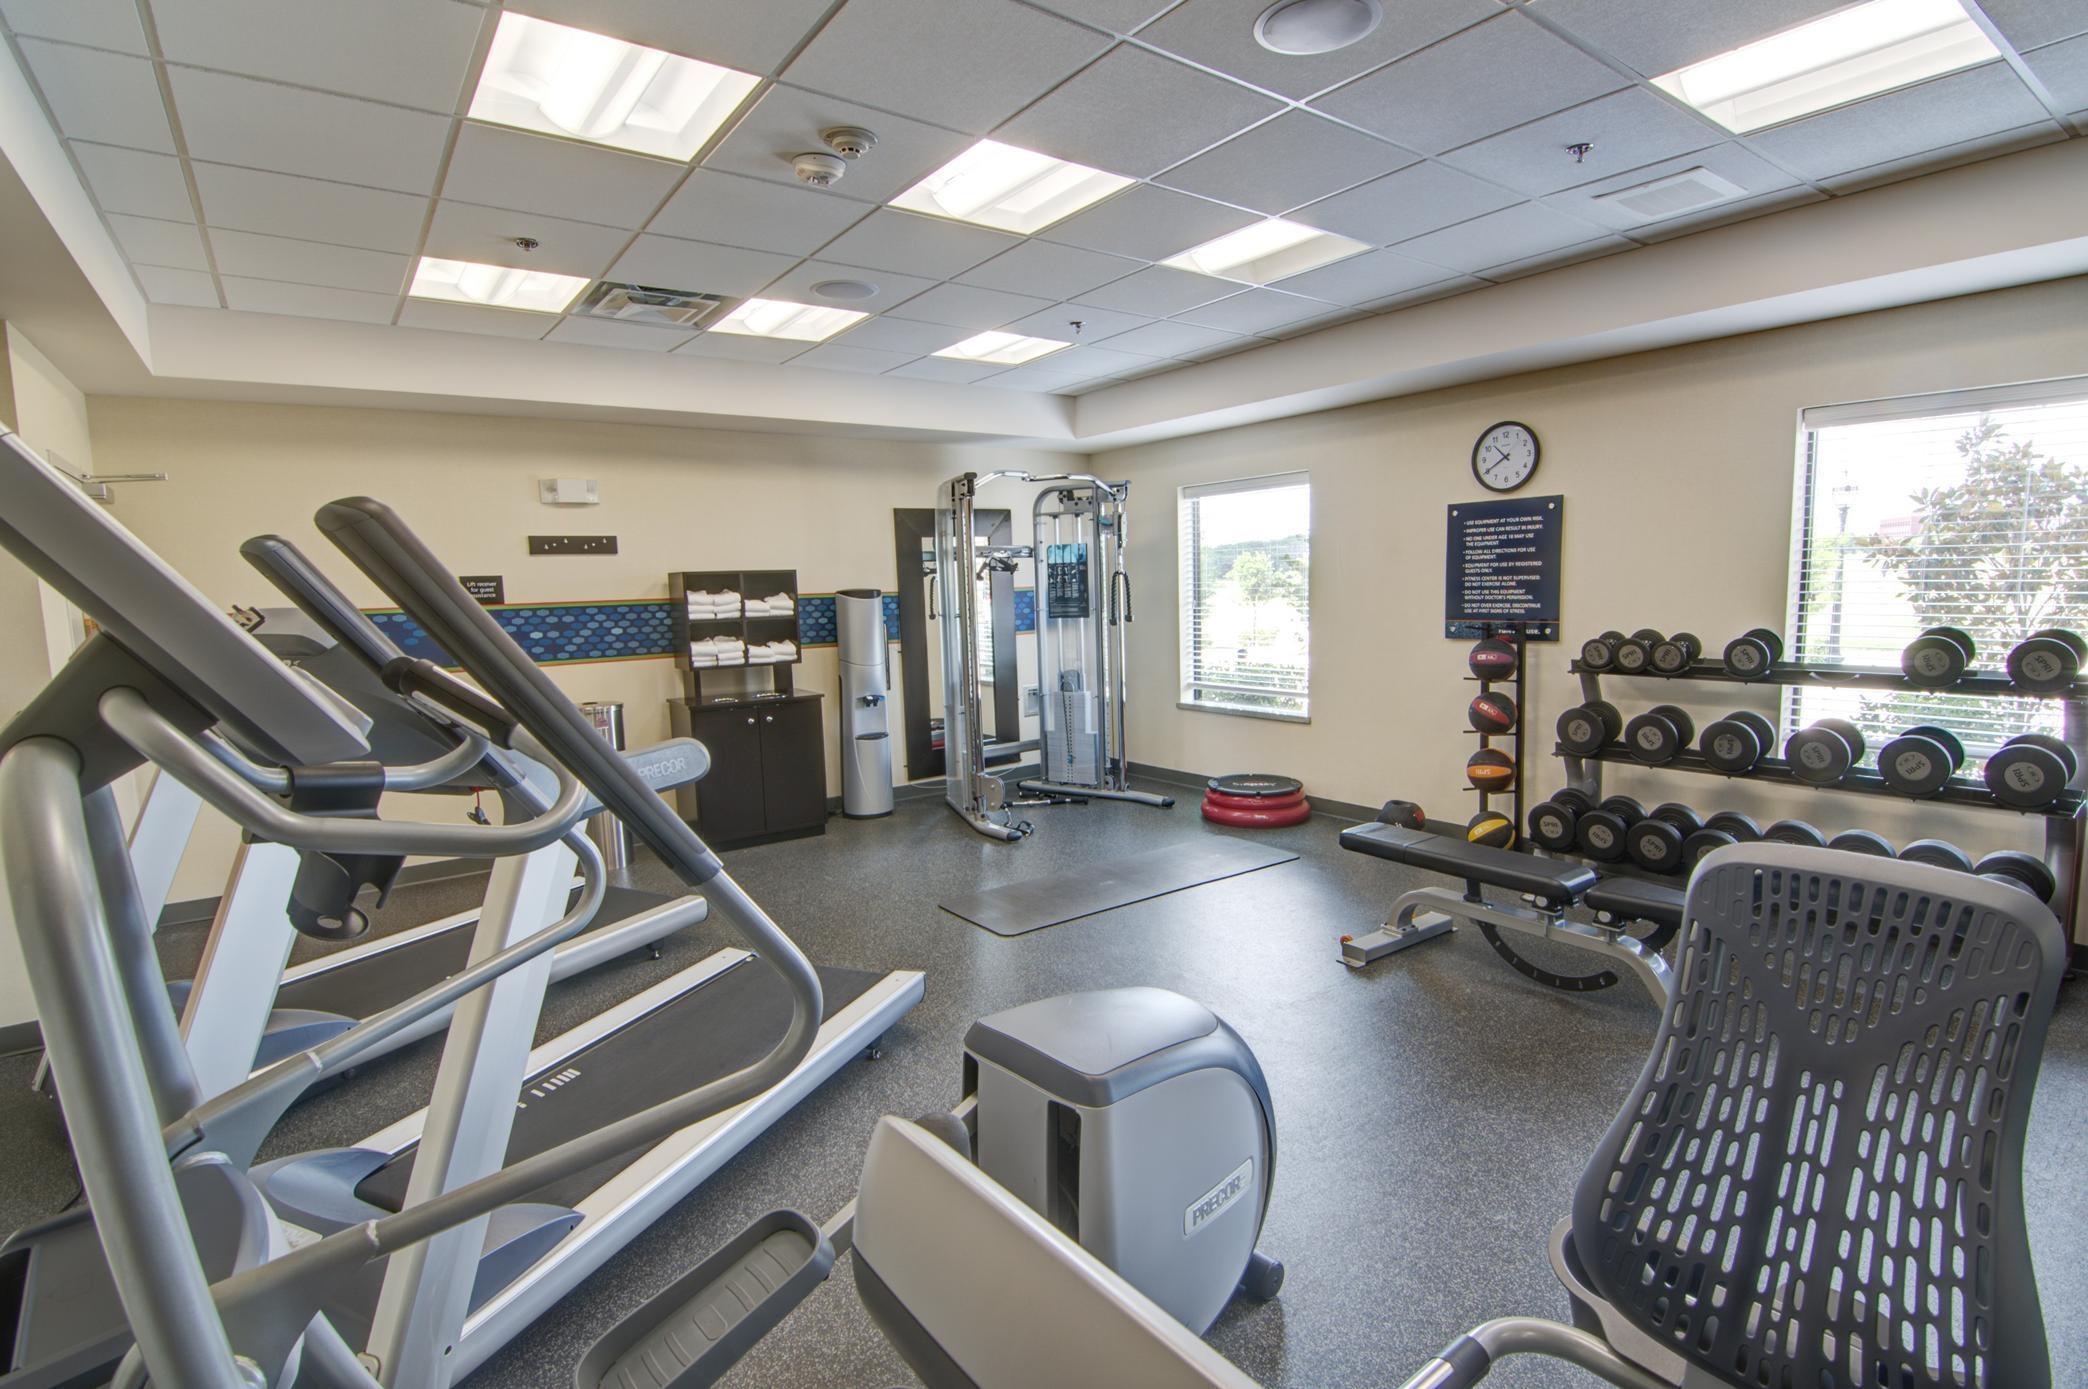 Hampton Inn & Suites Trophy Club - Fort Worth North image 7